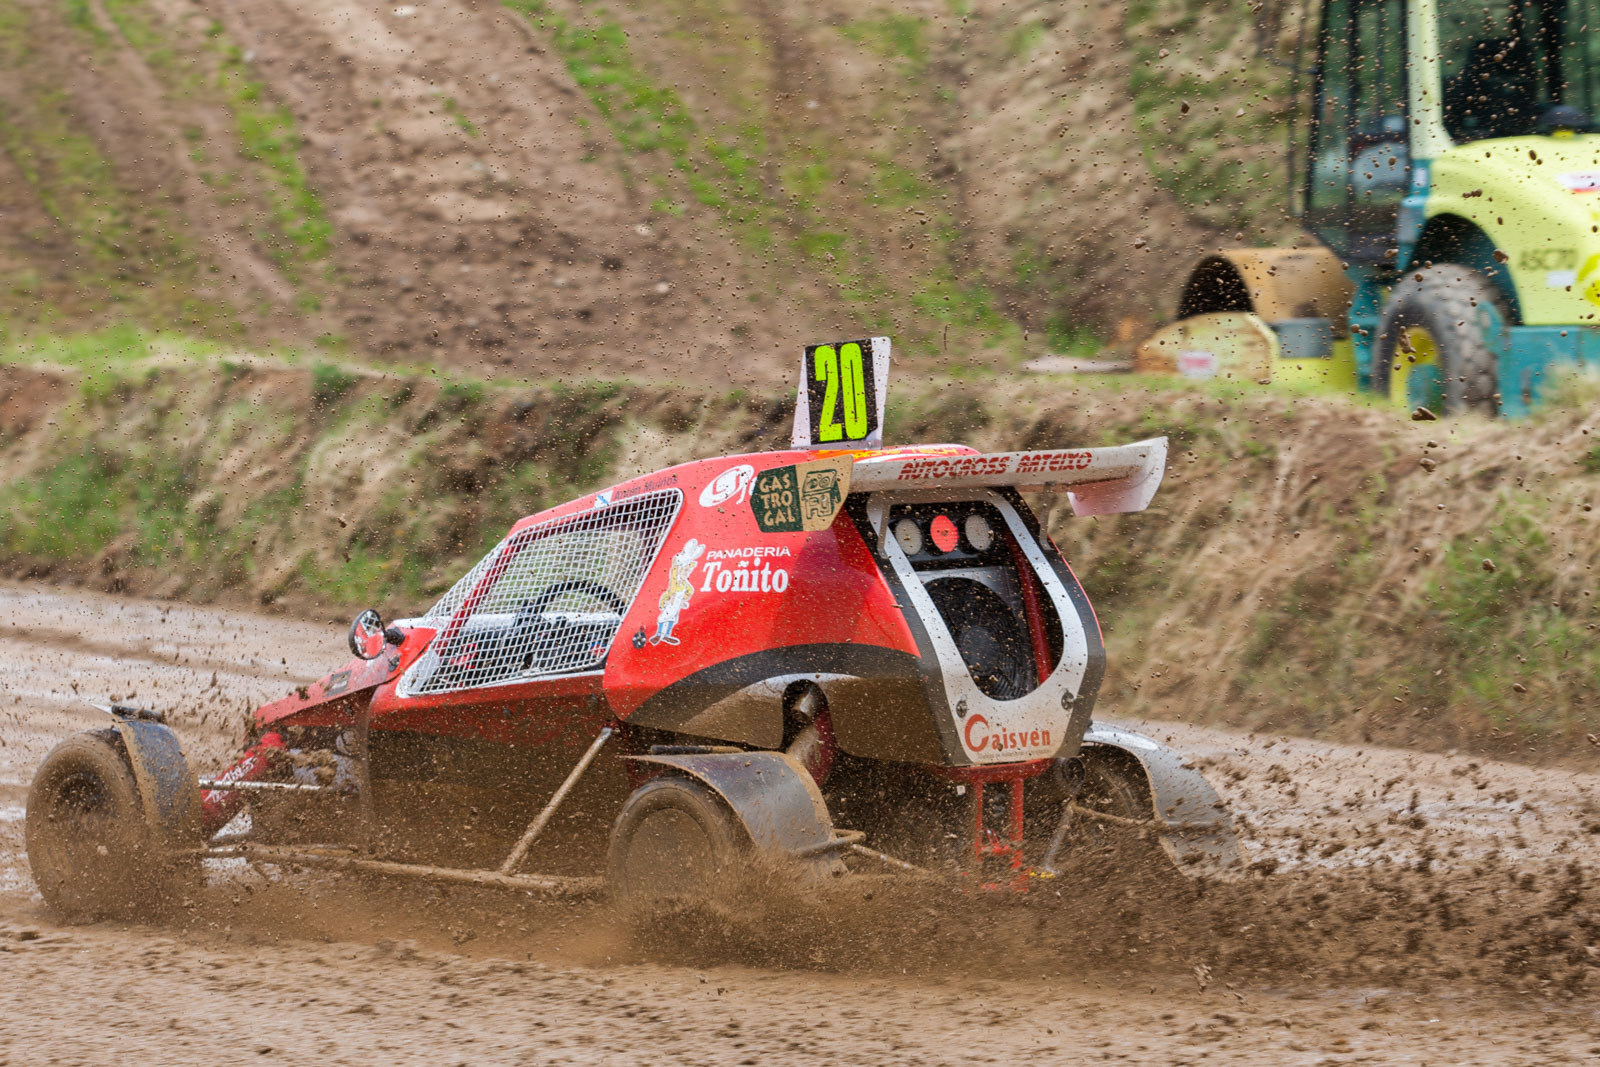 005 Autocross Carballo FGA 2016 012